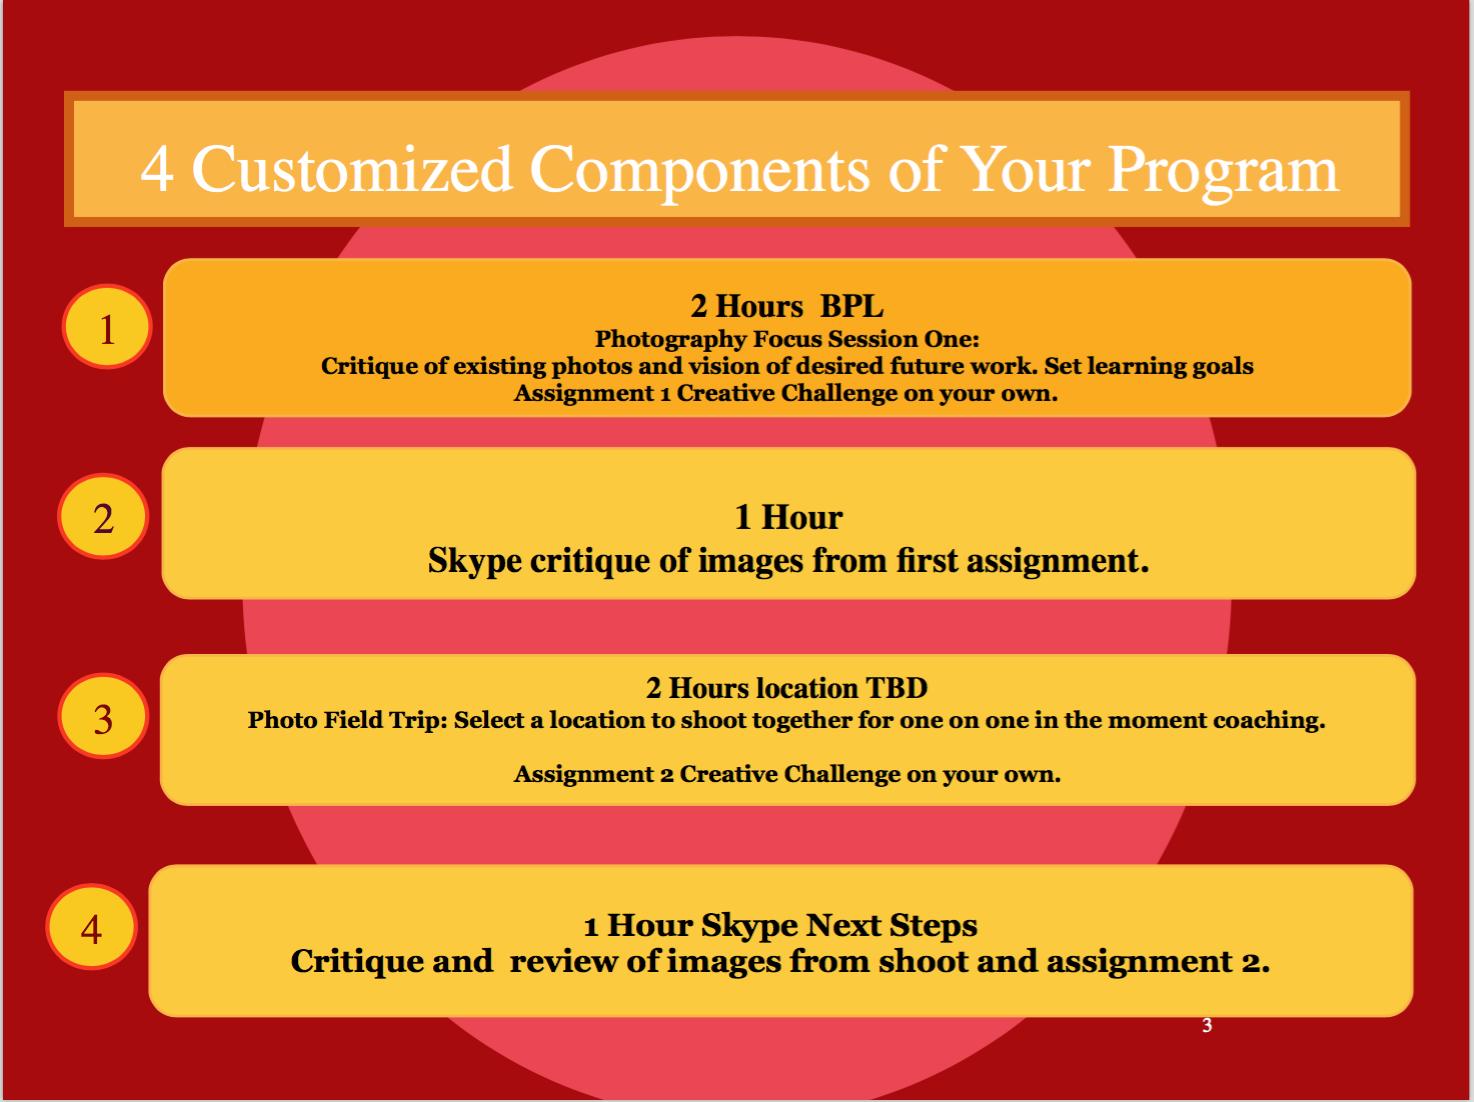 Basic Structure of the Mini Program